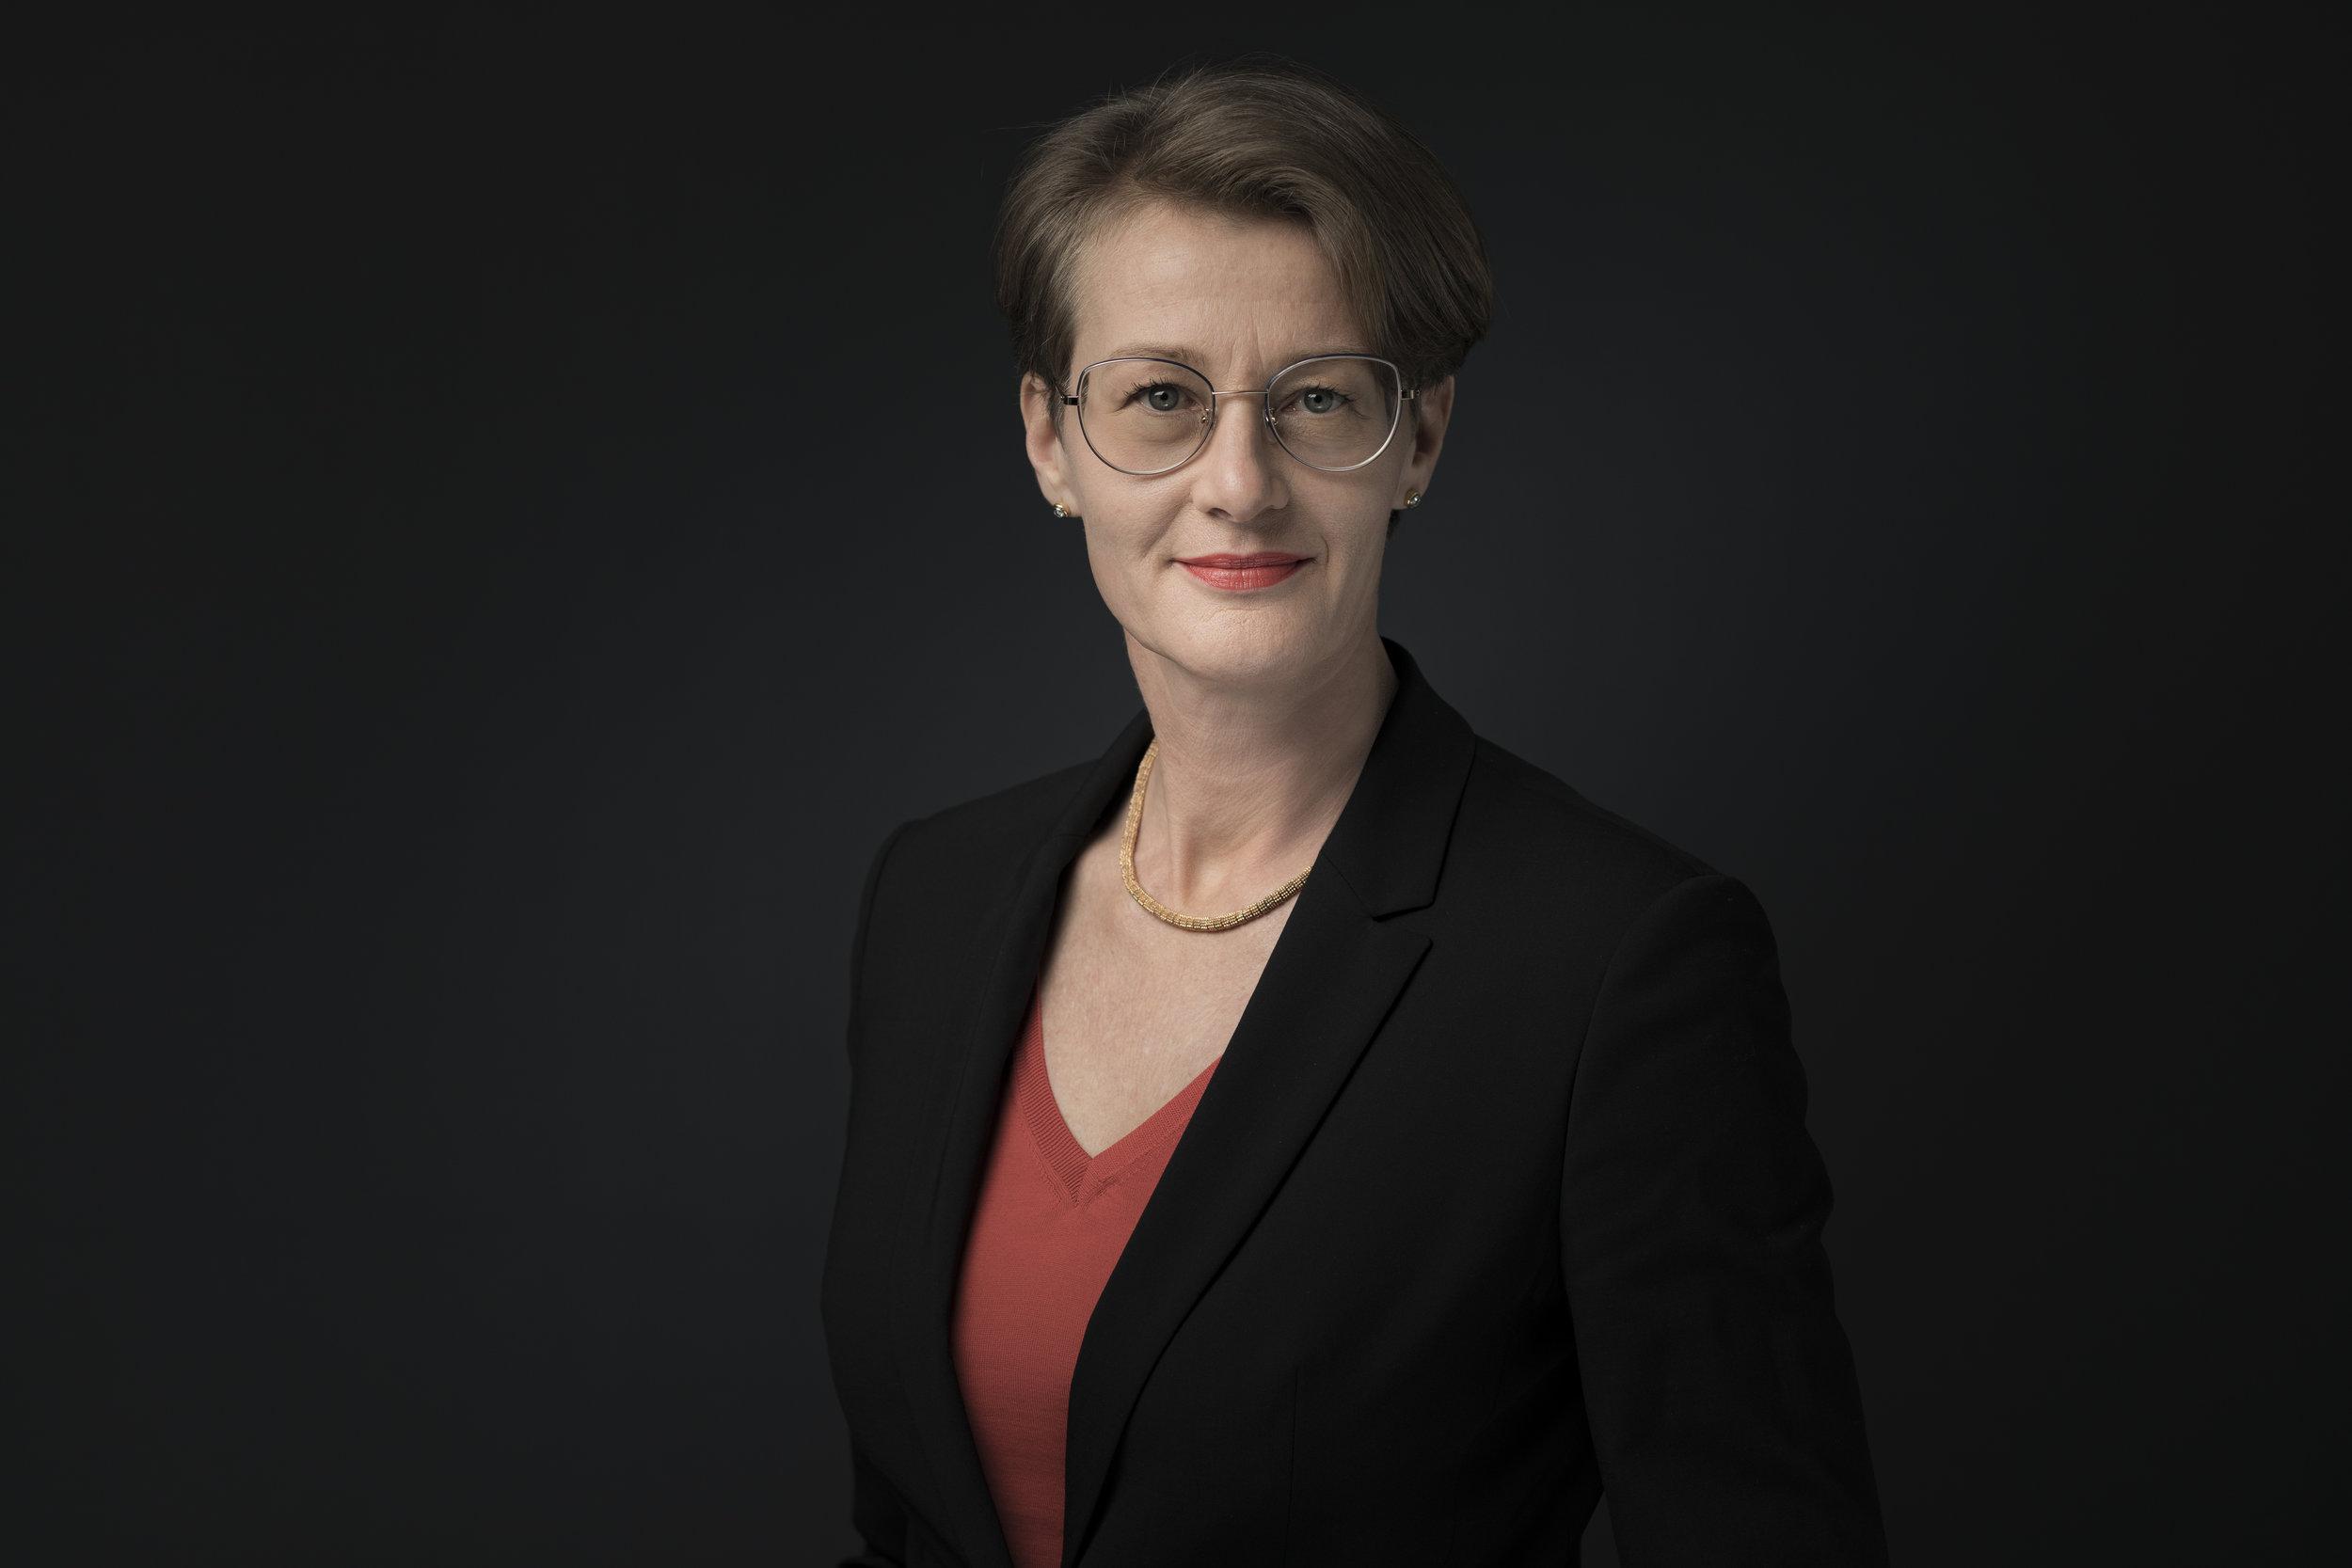 GABRIELA VAN HUISSELING lic. iur. LL.M. Rechtsanwältin